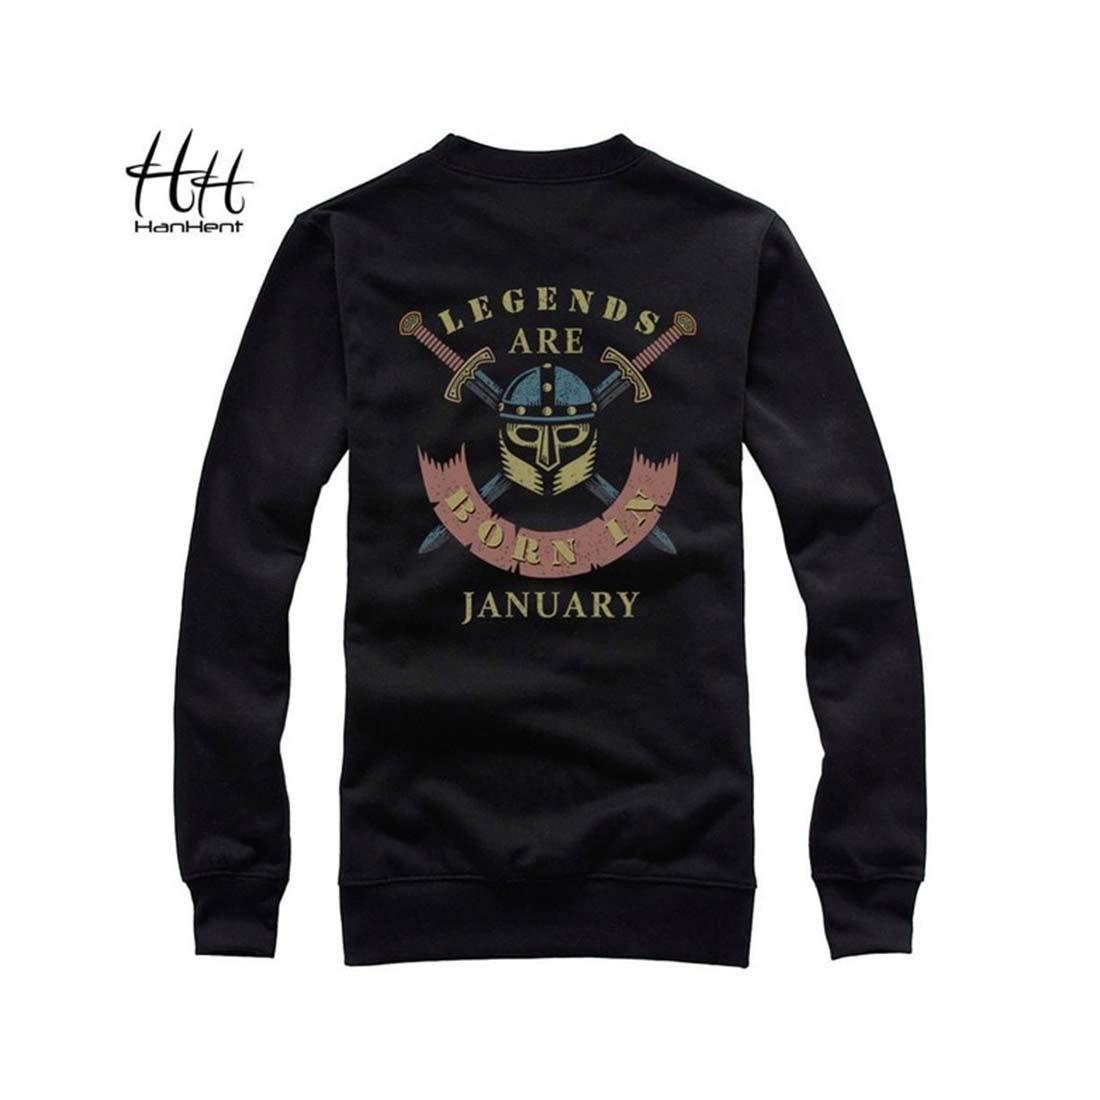 Indian Clothing Store HANHENT HH Polyester O-Neck Black Men Sweatshirts